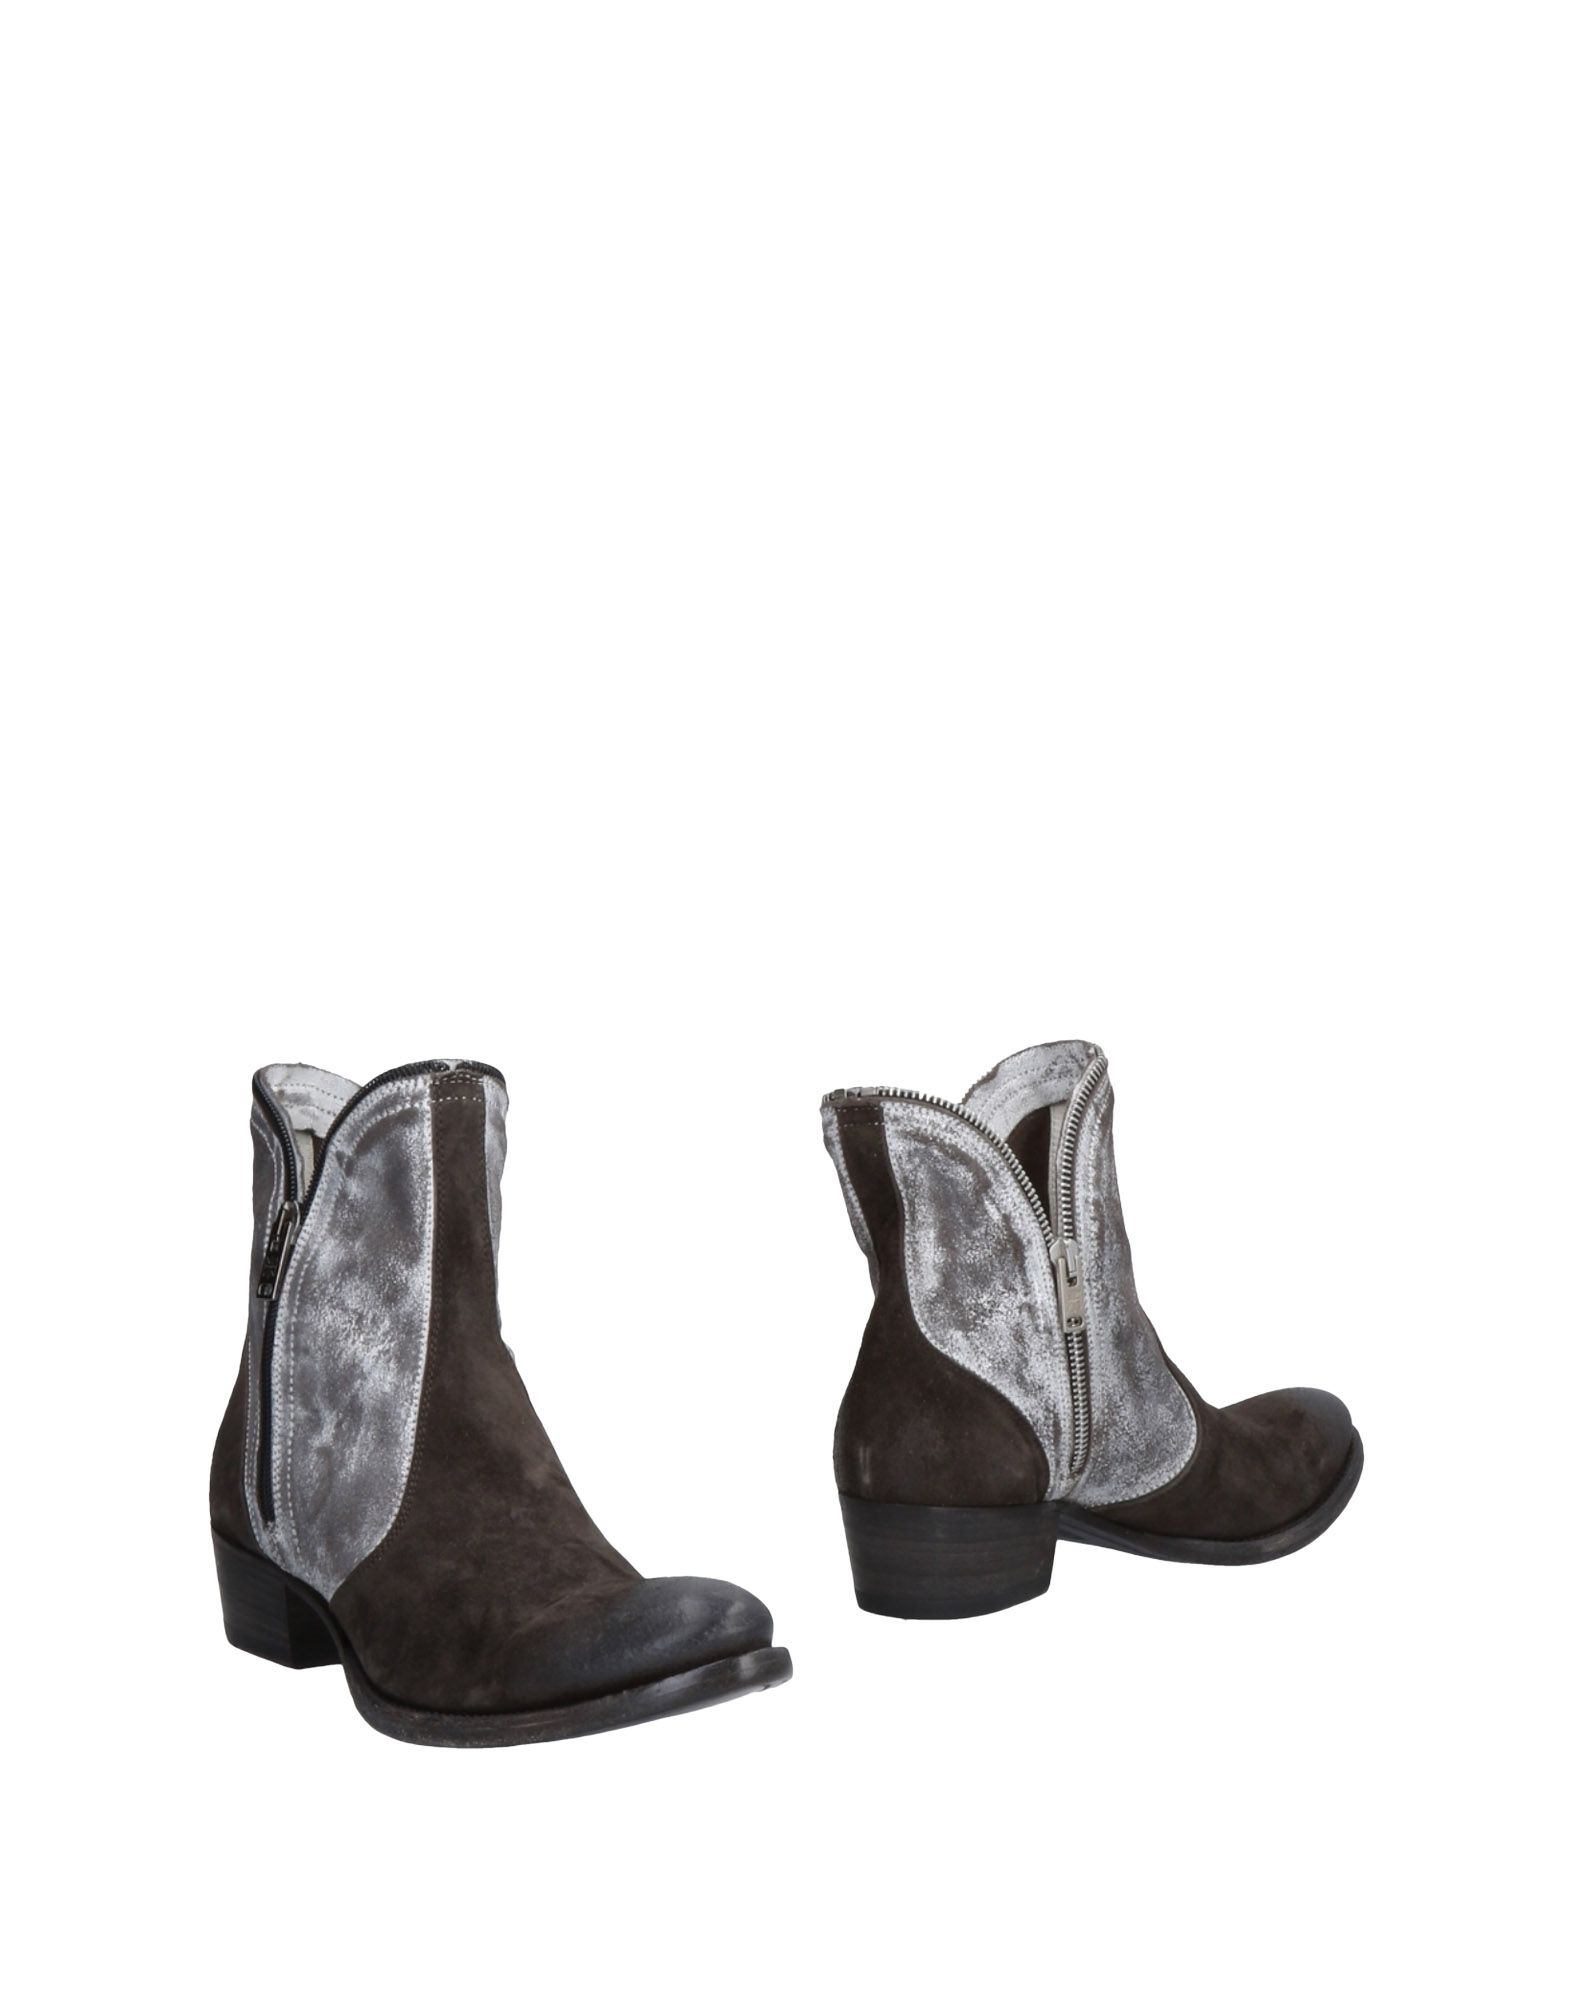 Pantanetti Stiefelette Damen 11468183BCGut strapazierfähige aussehende strapazierfähige 11468183BCGut Schuhe 61d5a9